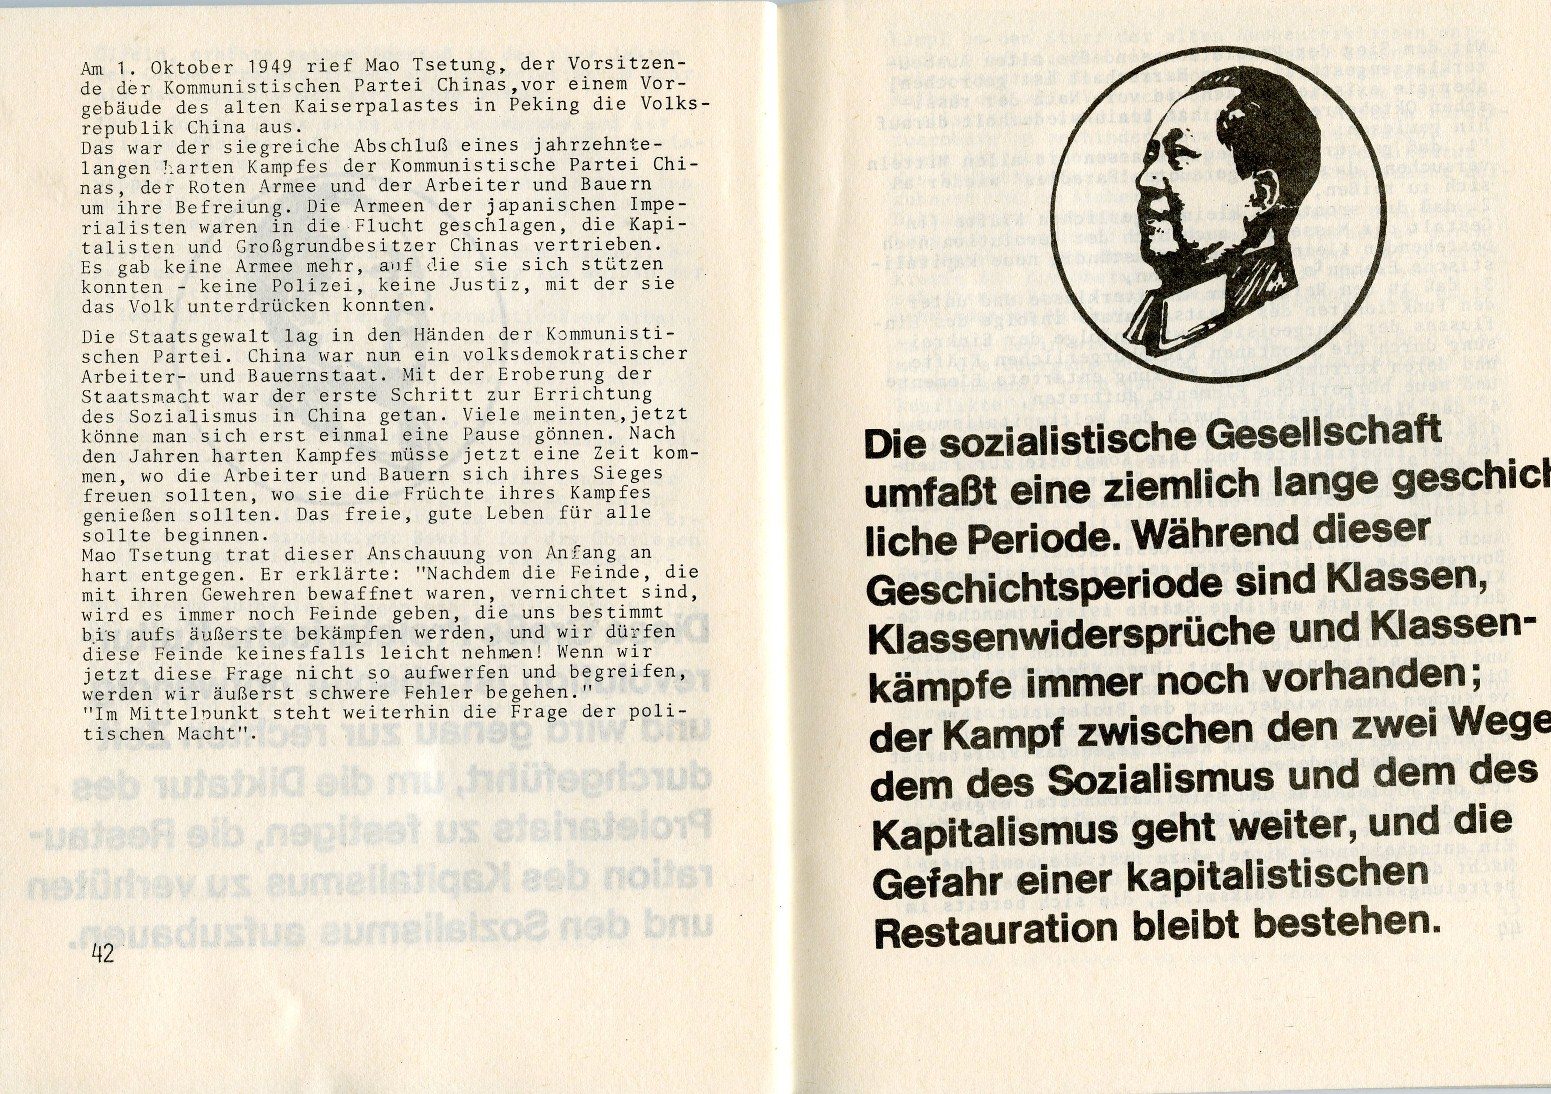 ZB_KPChinas_1971_23